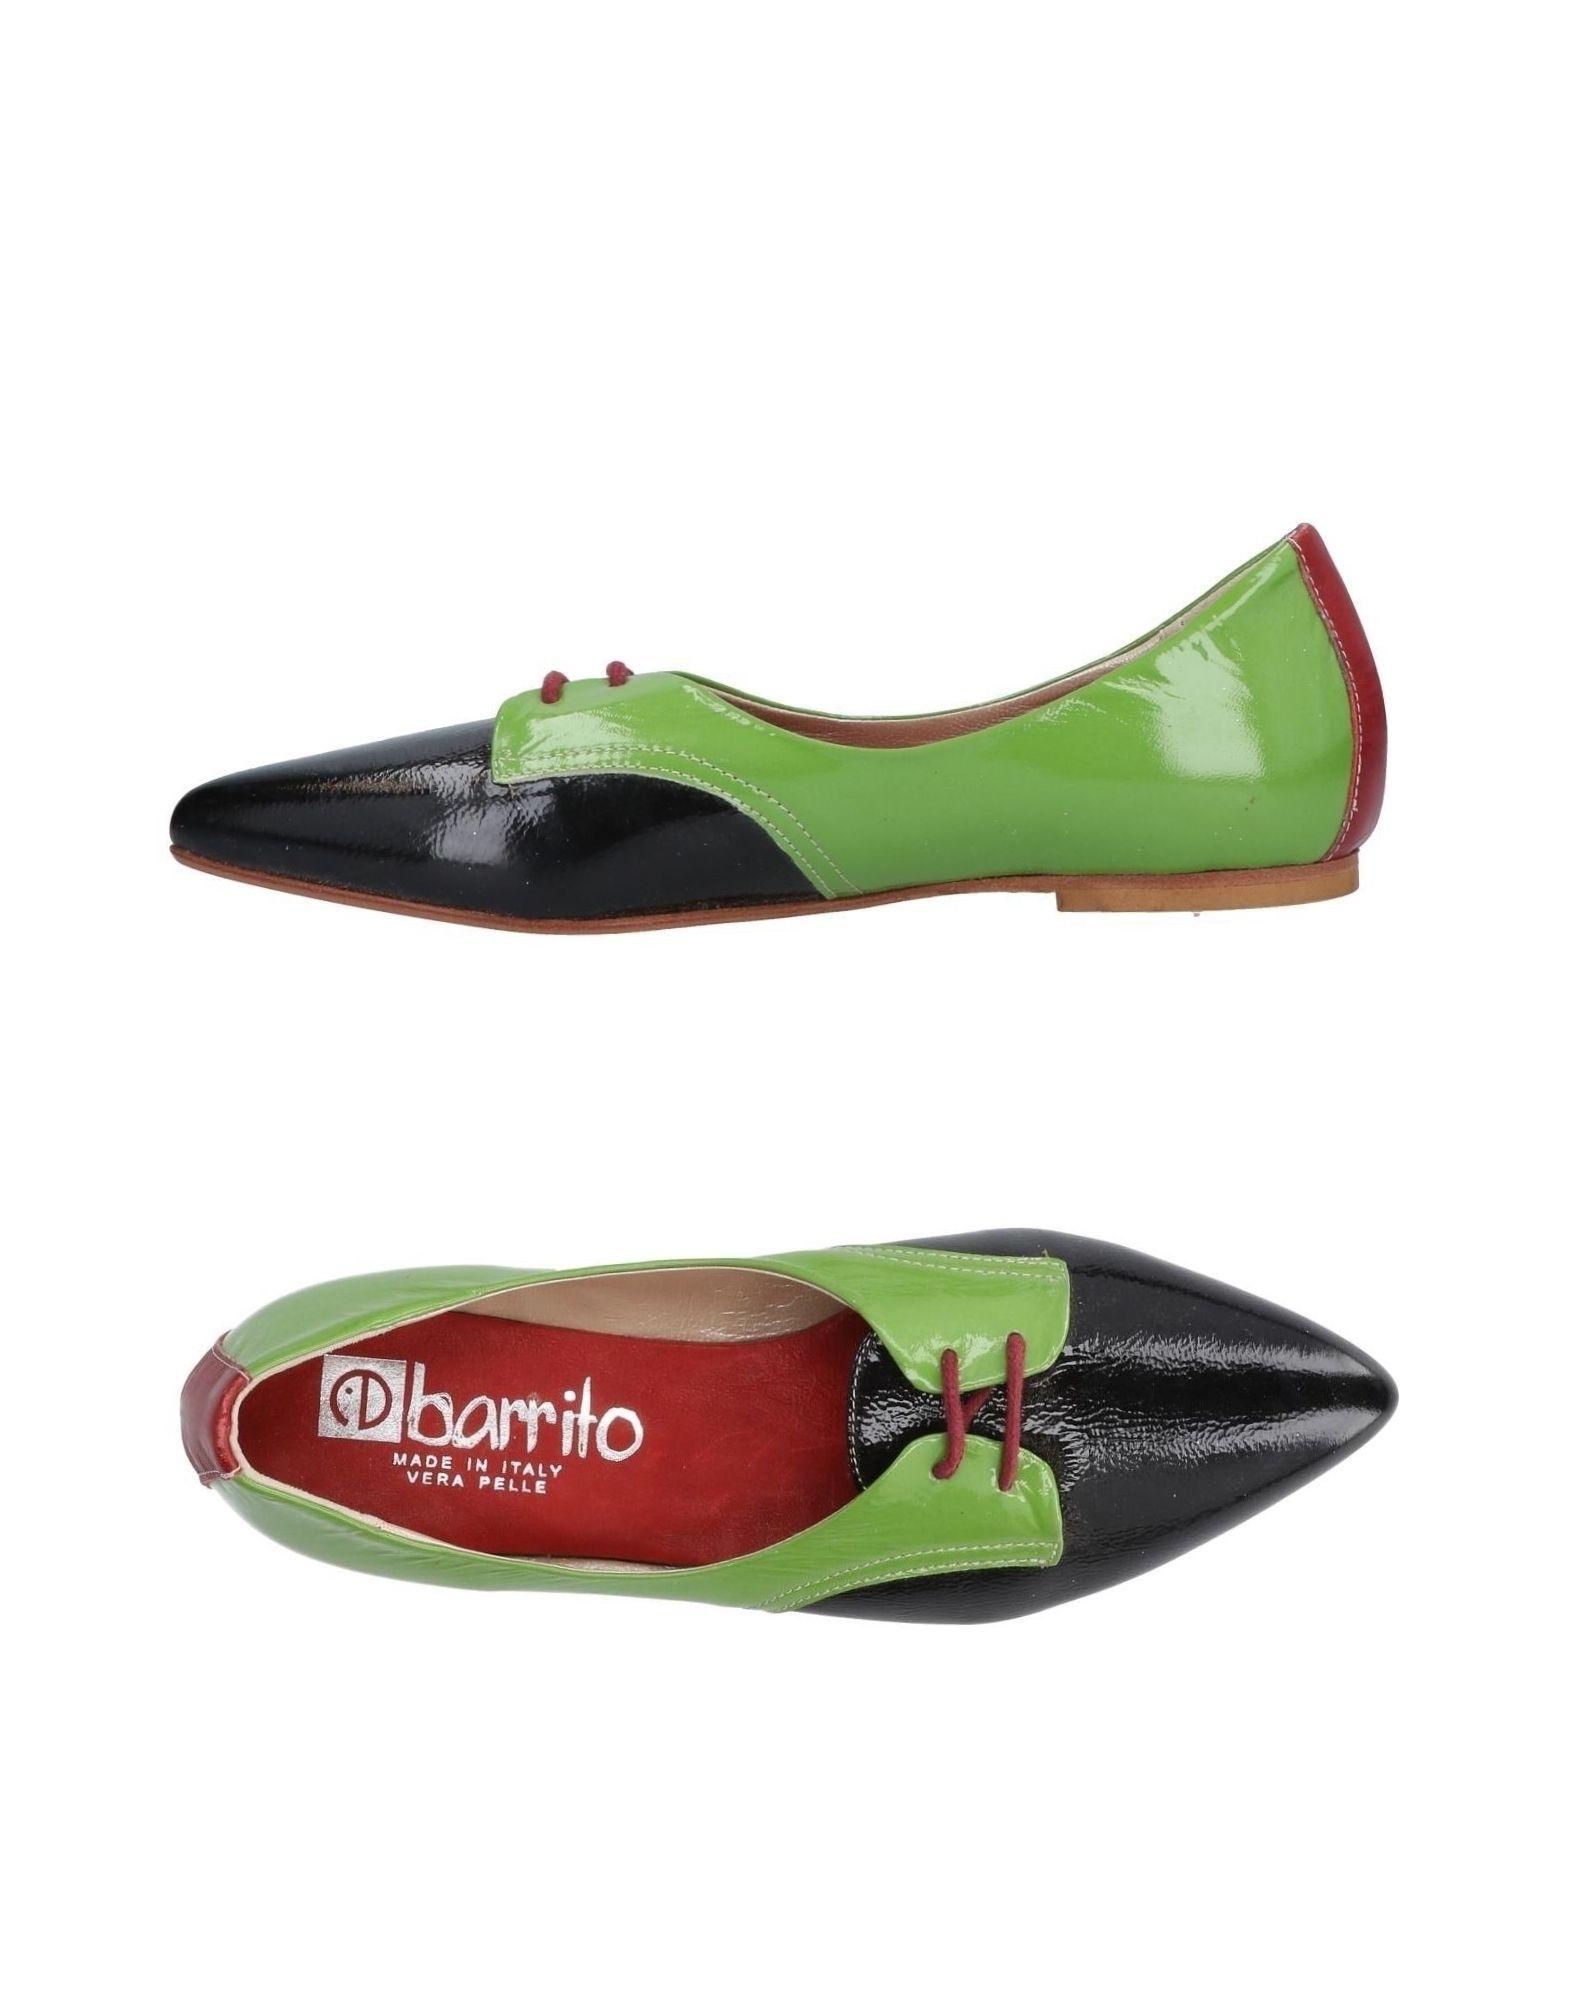 Ebarrito Mokassins Mokassins Ebarrito Damen  11458601GA Gute Qualität beliebte Schuhe 2ca54f